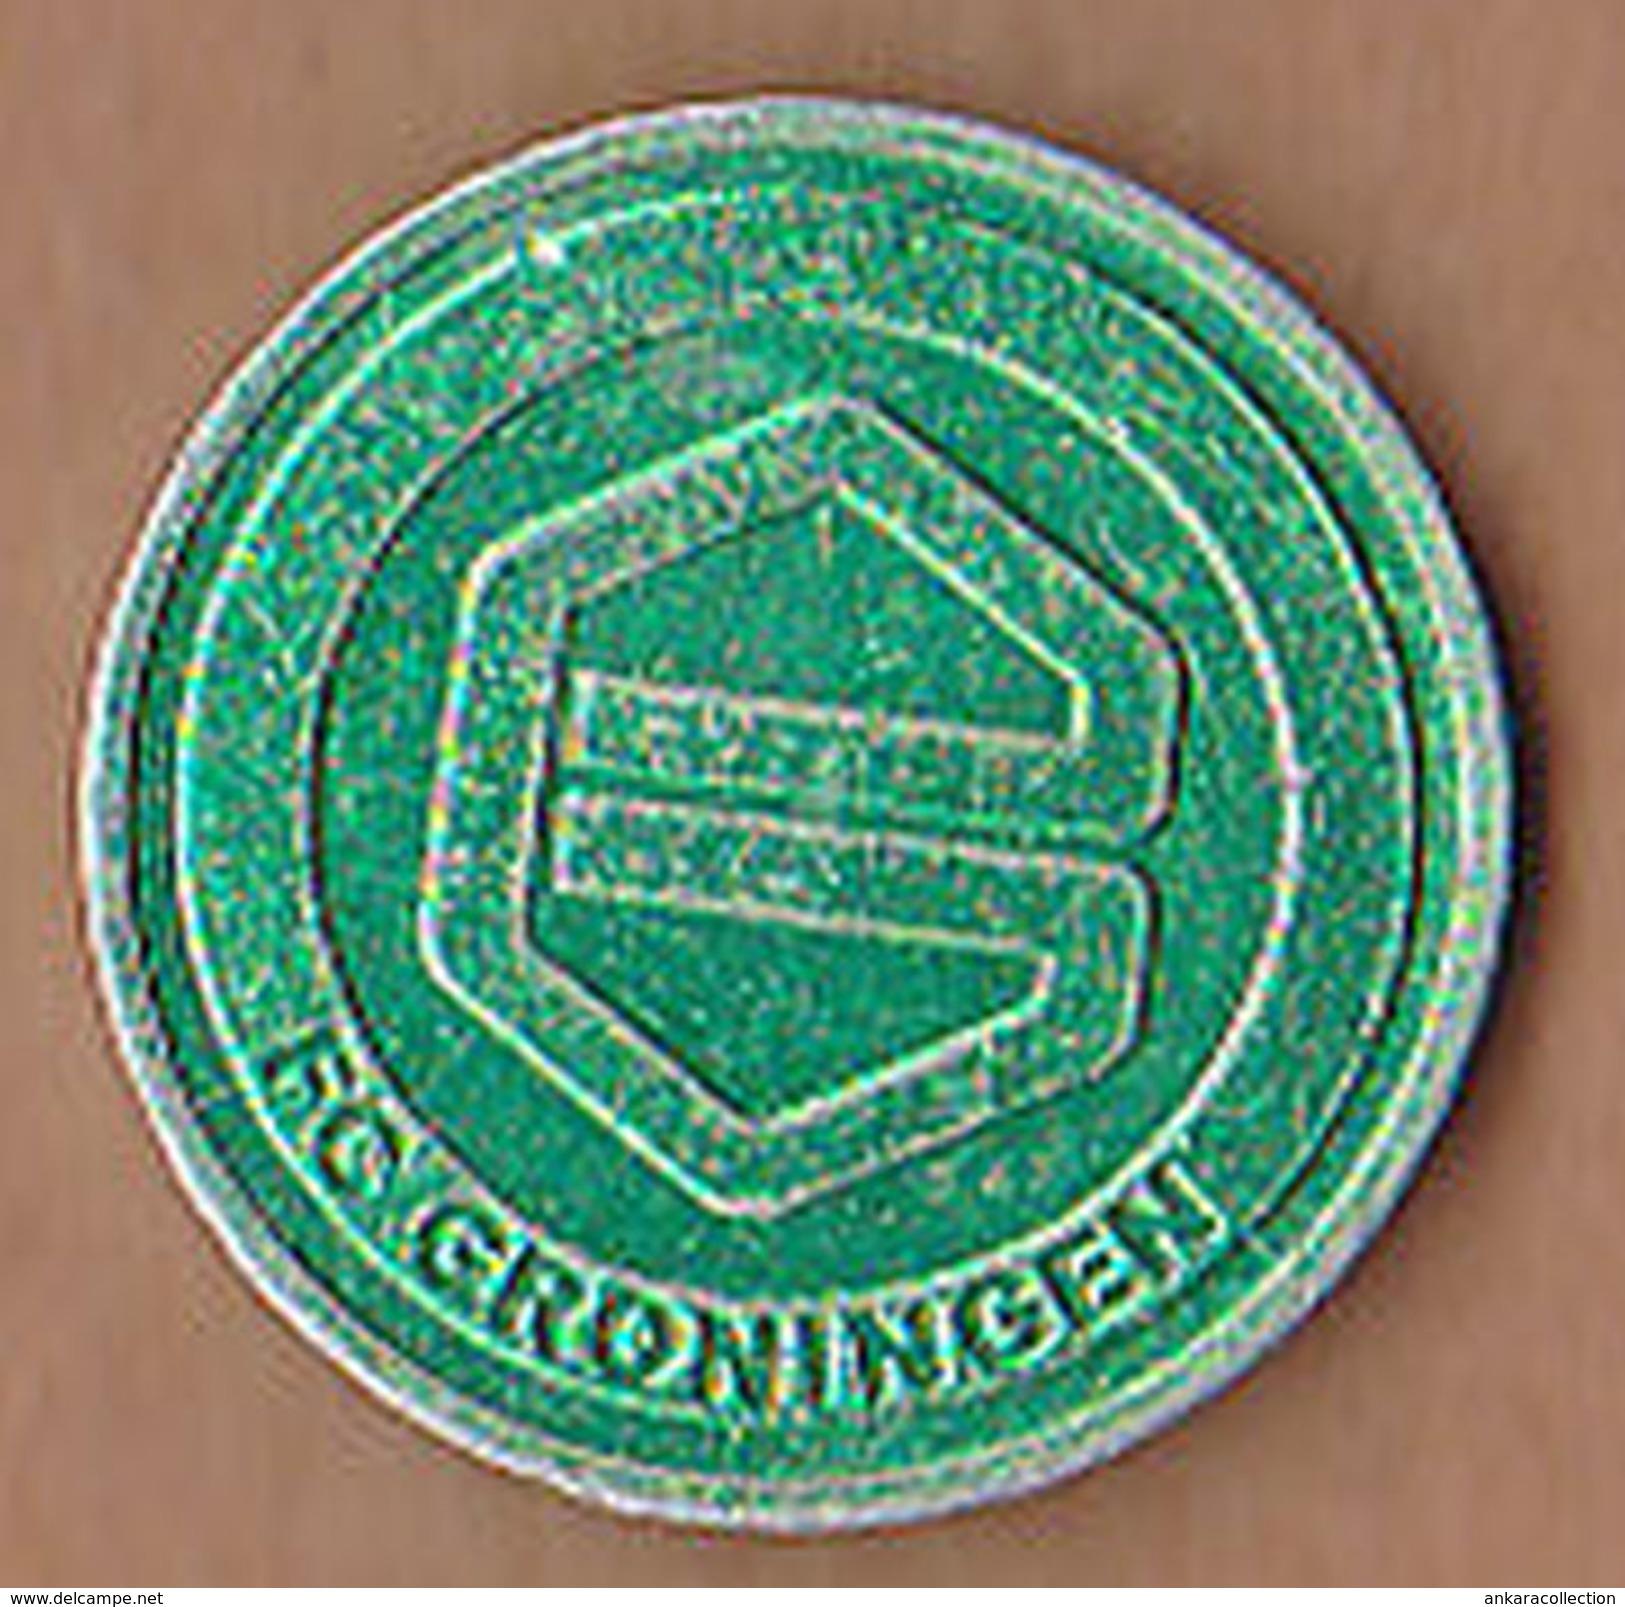 AC -  FC GRONINGEN NEDERLANDS - HOLLAND FOOTBALL SOCCER CLUB TOKEN JETON - Noodgeld